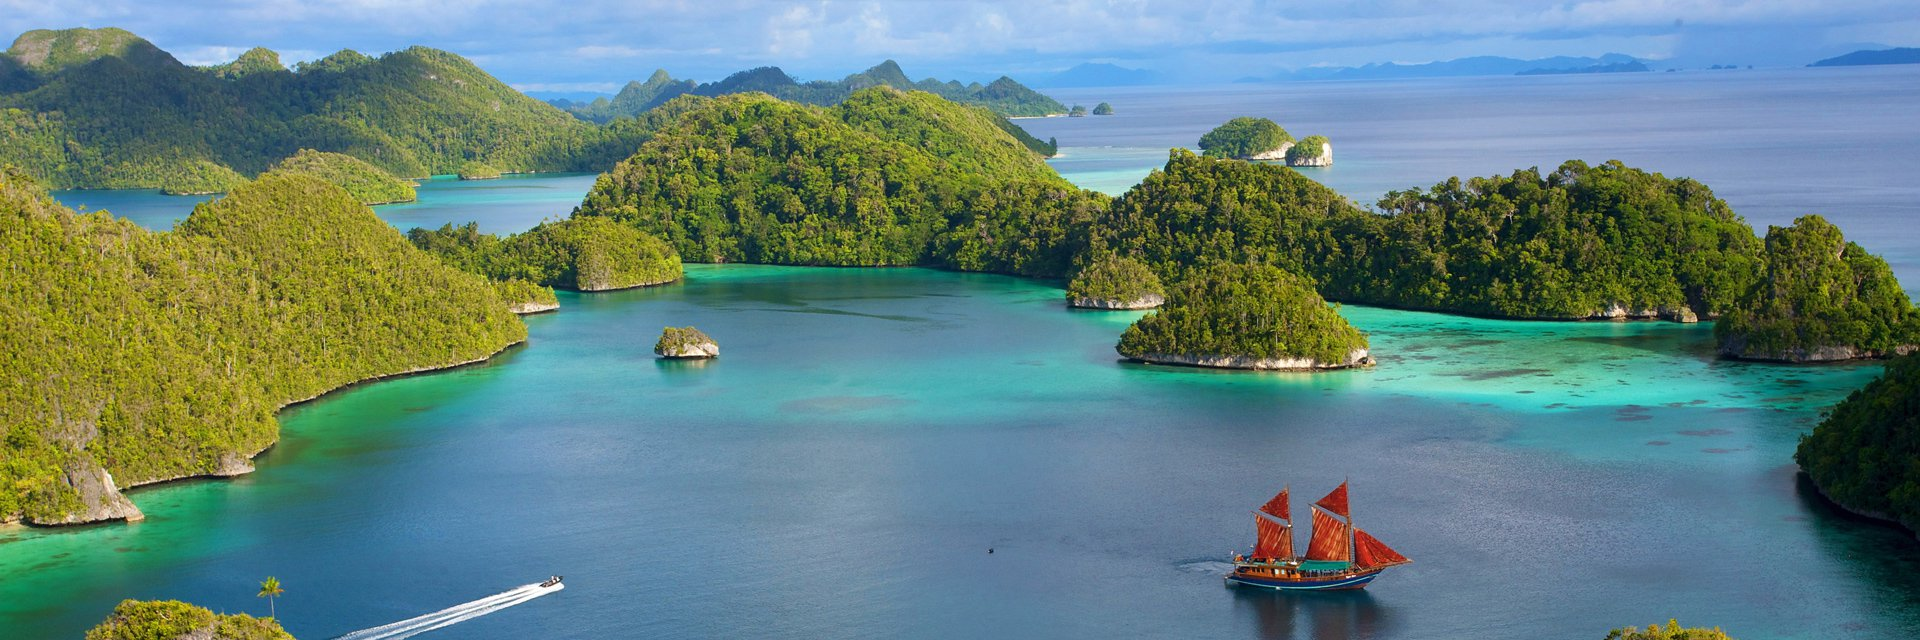 Mercure Bali Legian 4* (Кута, Индонезия) - цены, отзывы, фото, бронирование - ПАКС